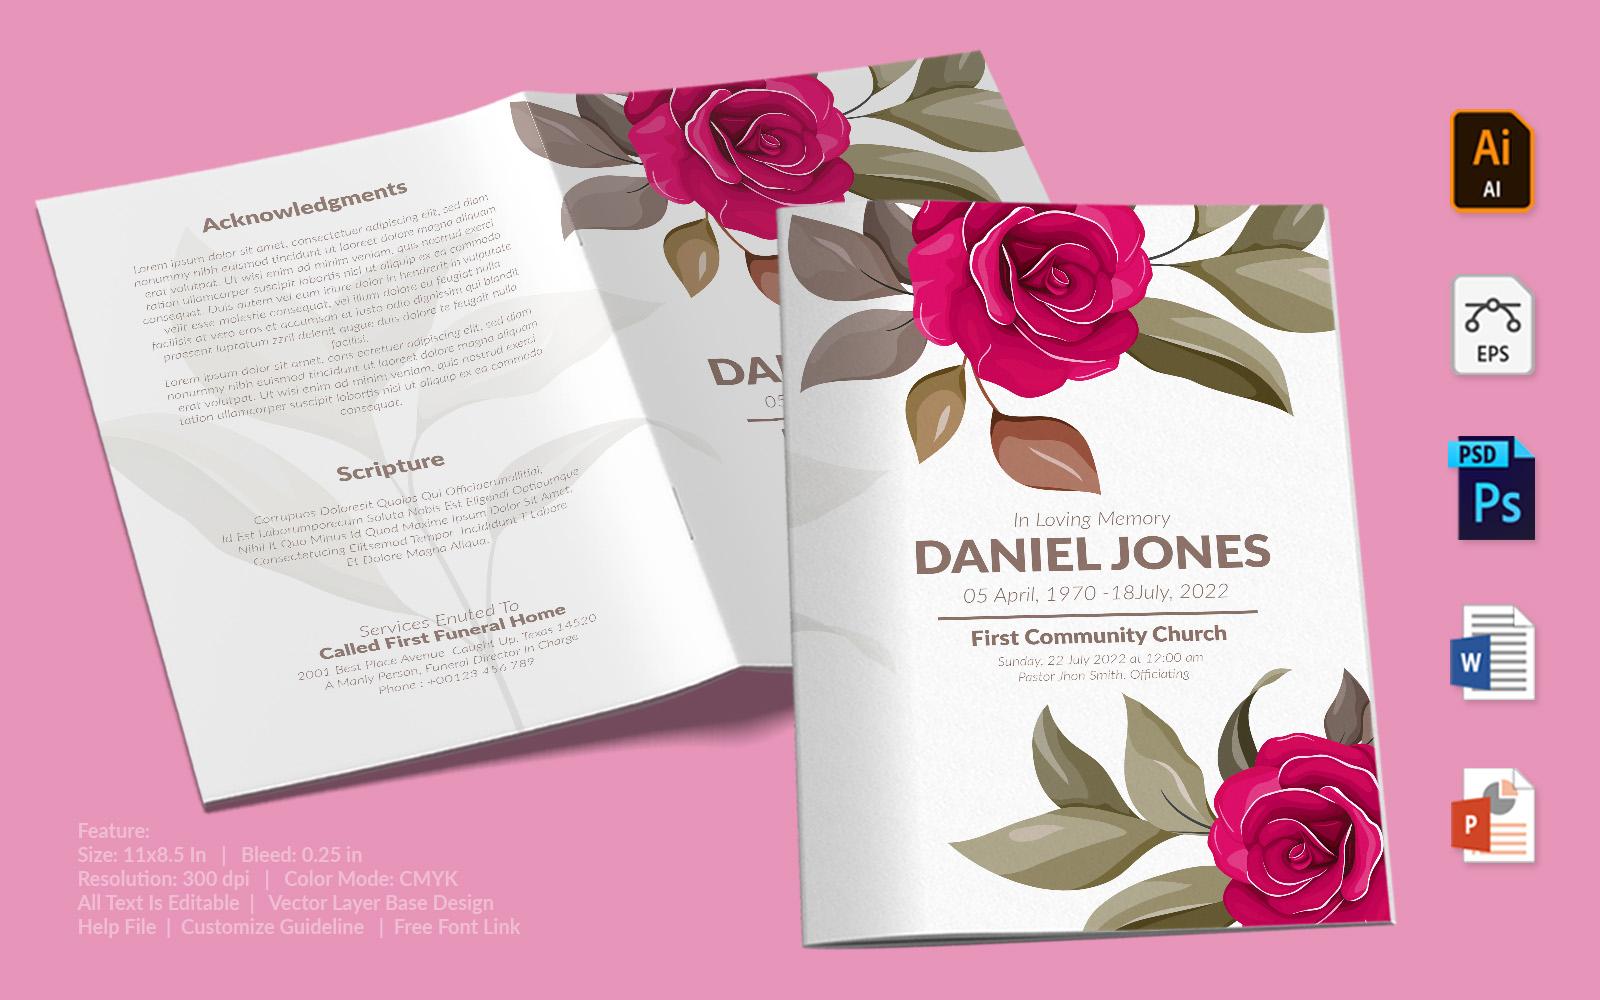 Printable Funeral Program - Beautiful Illustrated Rose Theme Template